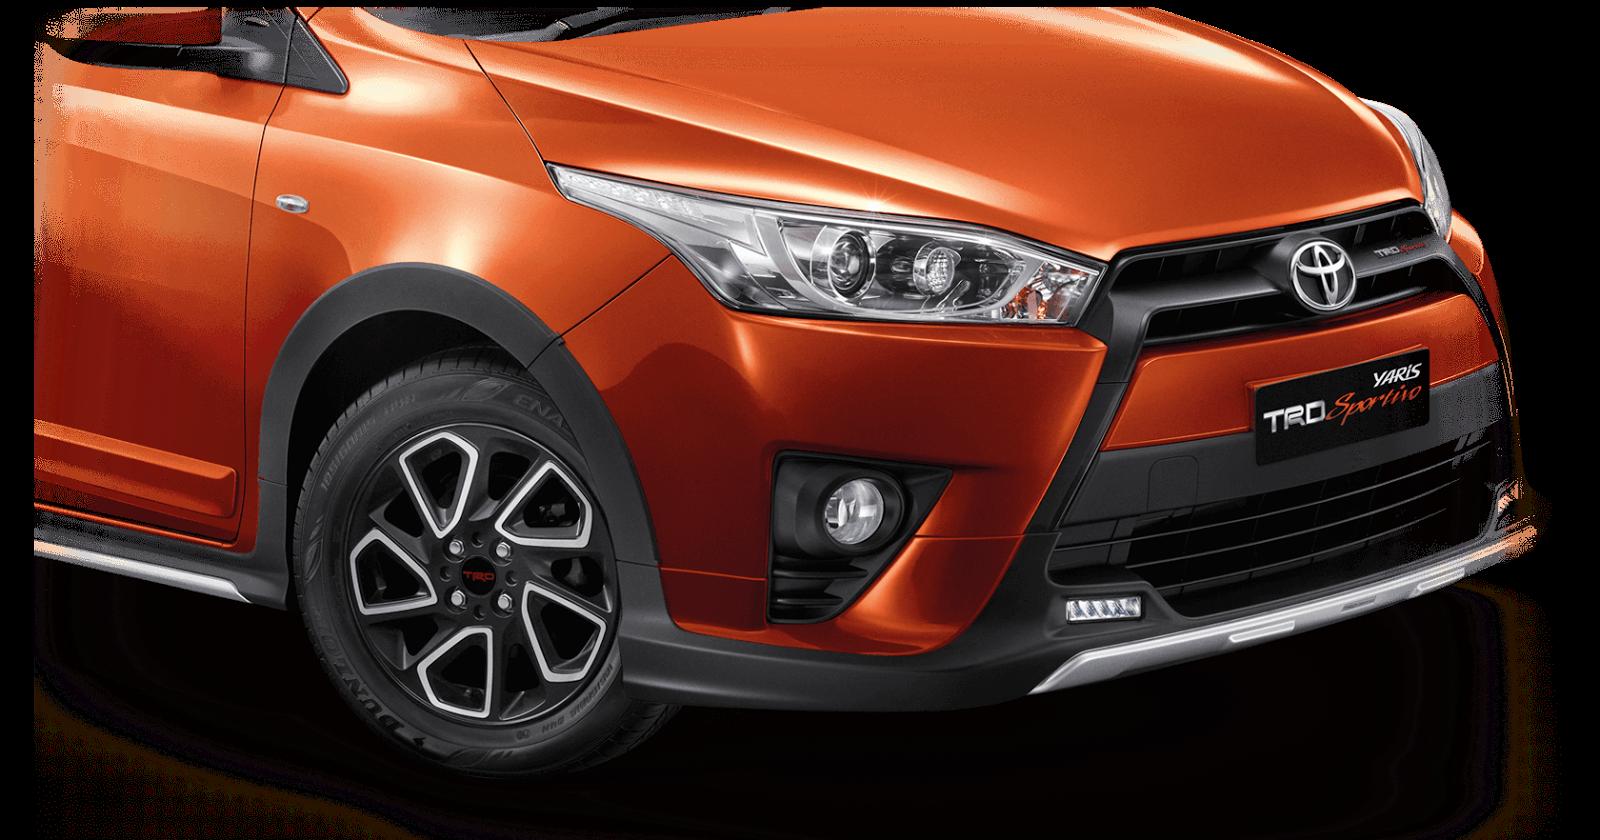 Harga New Yaris Trd Sportivo 2014 Oli Mesin Grand Avanza Car News Update Toyota ปรบเตม